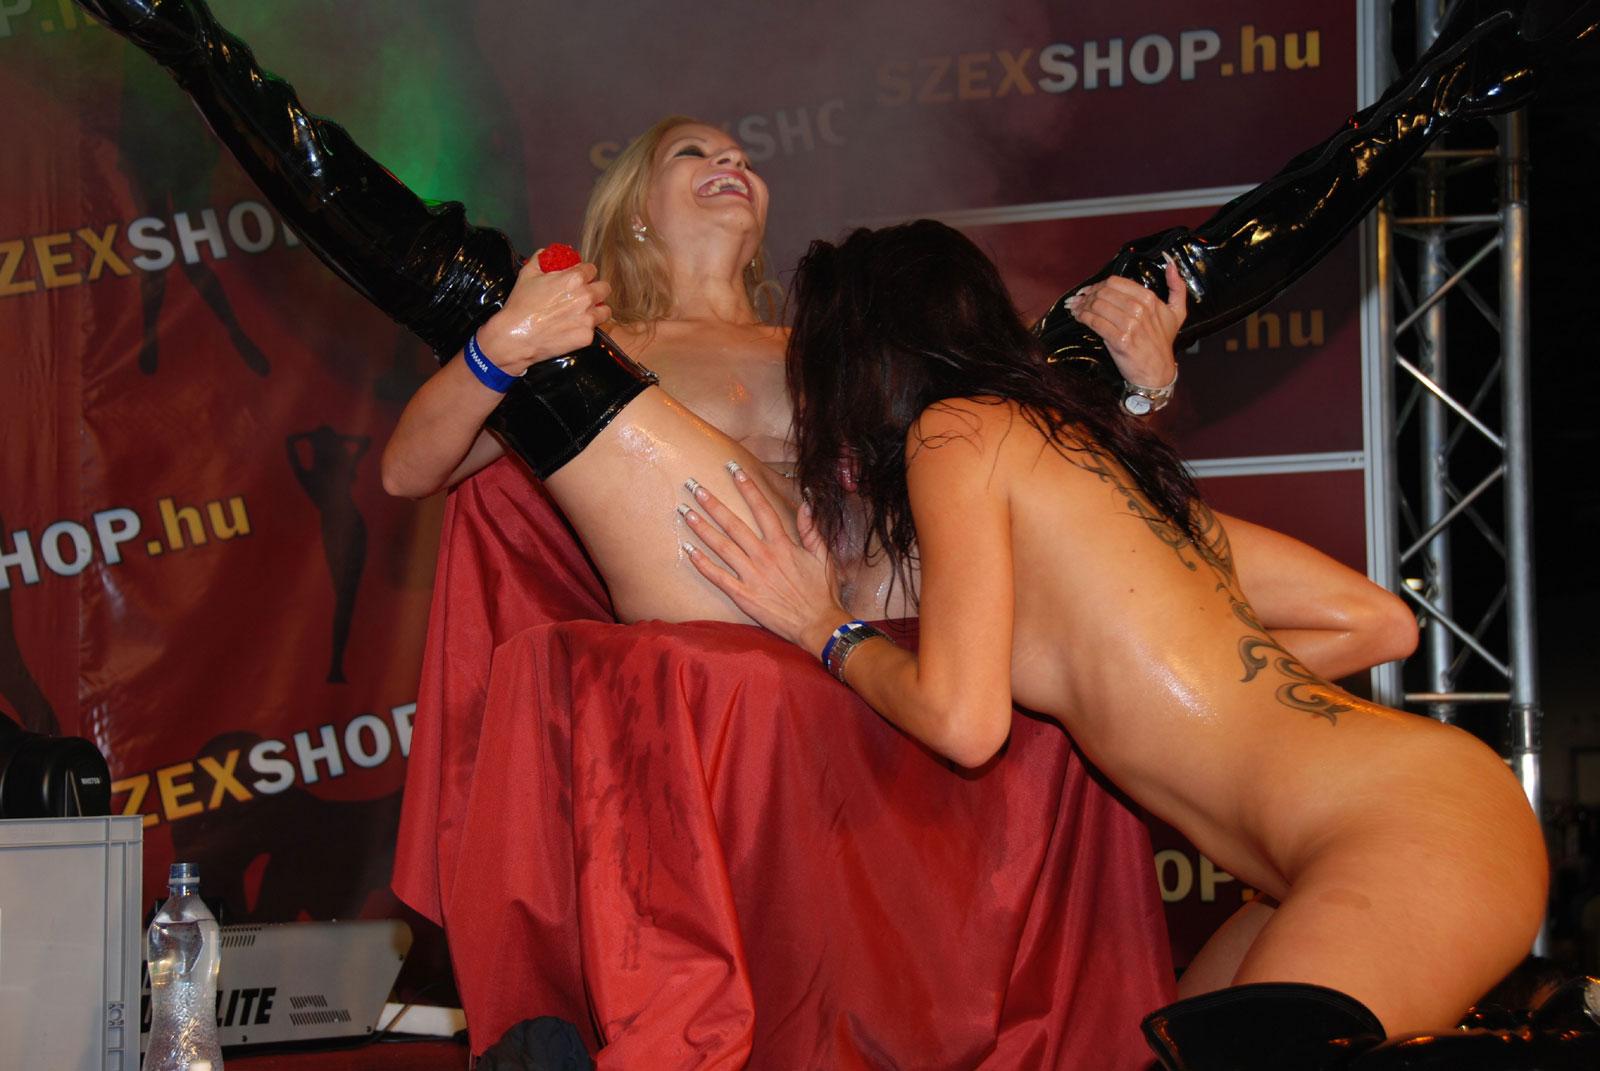 erotic massage cairns avn awards best anal